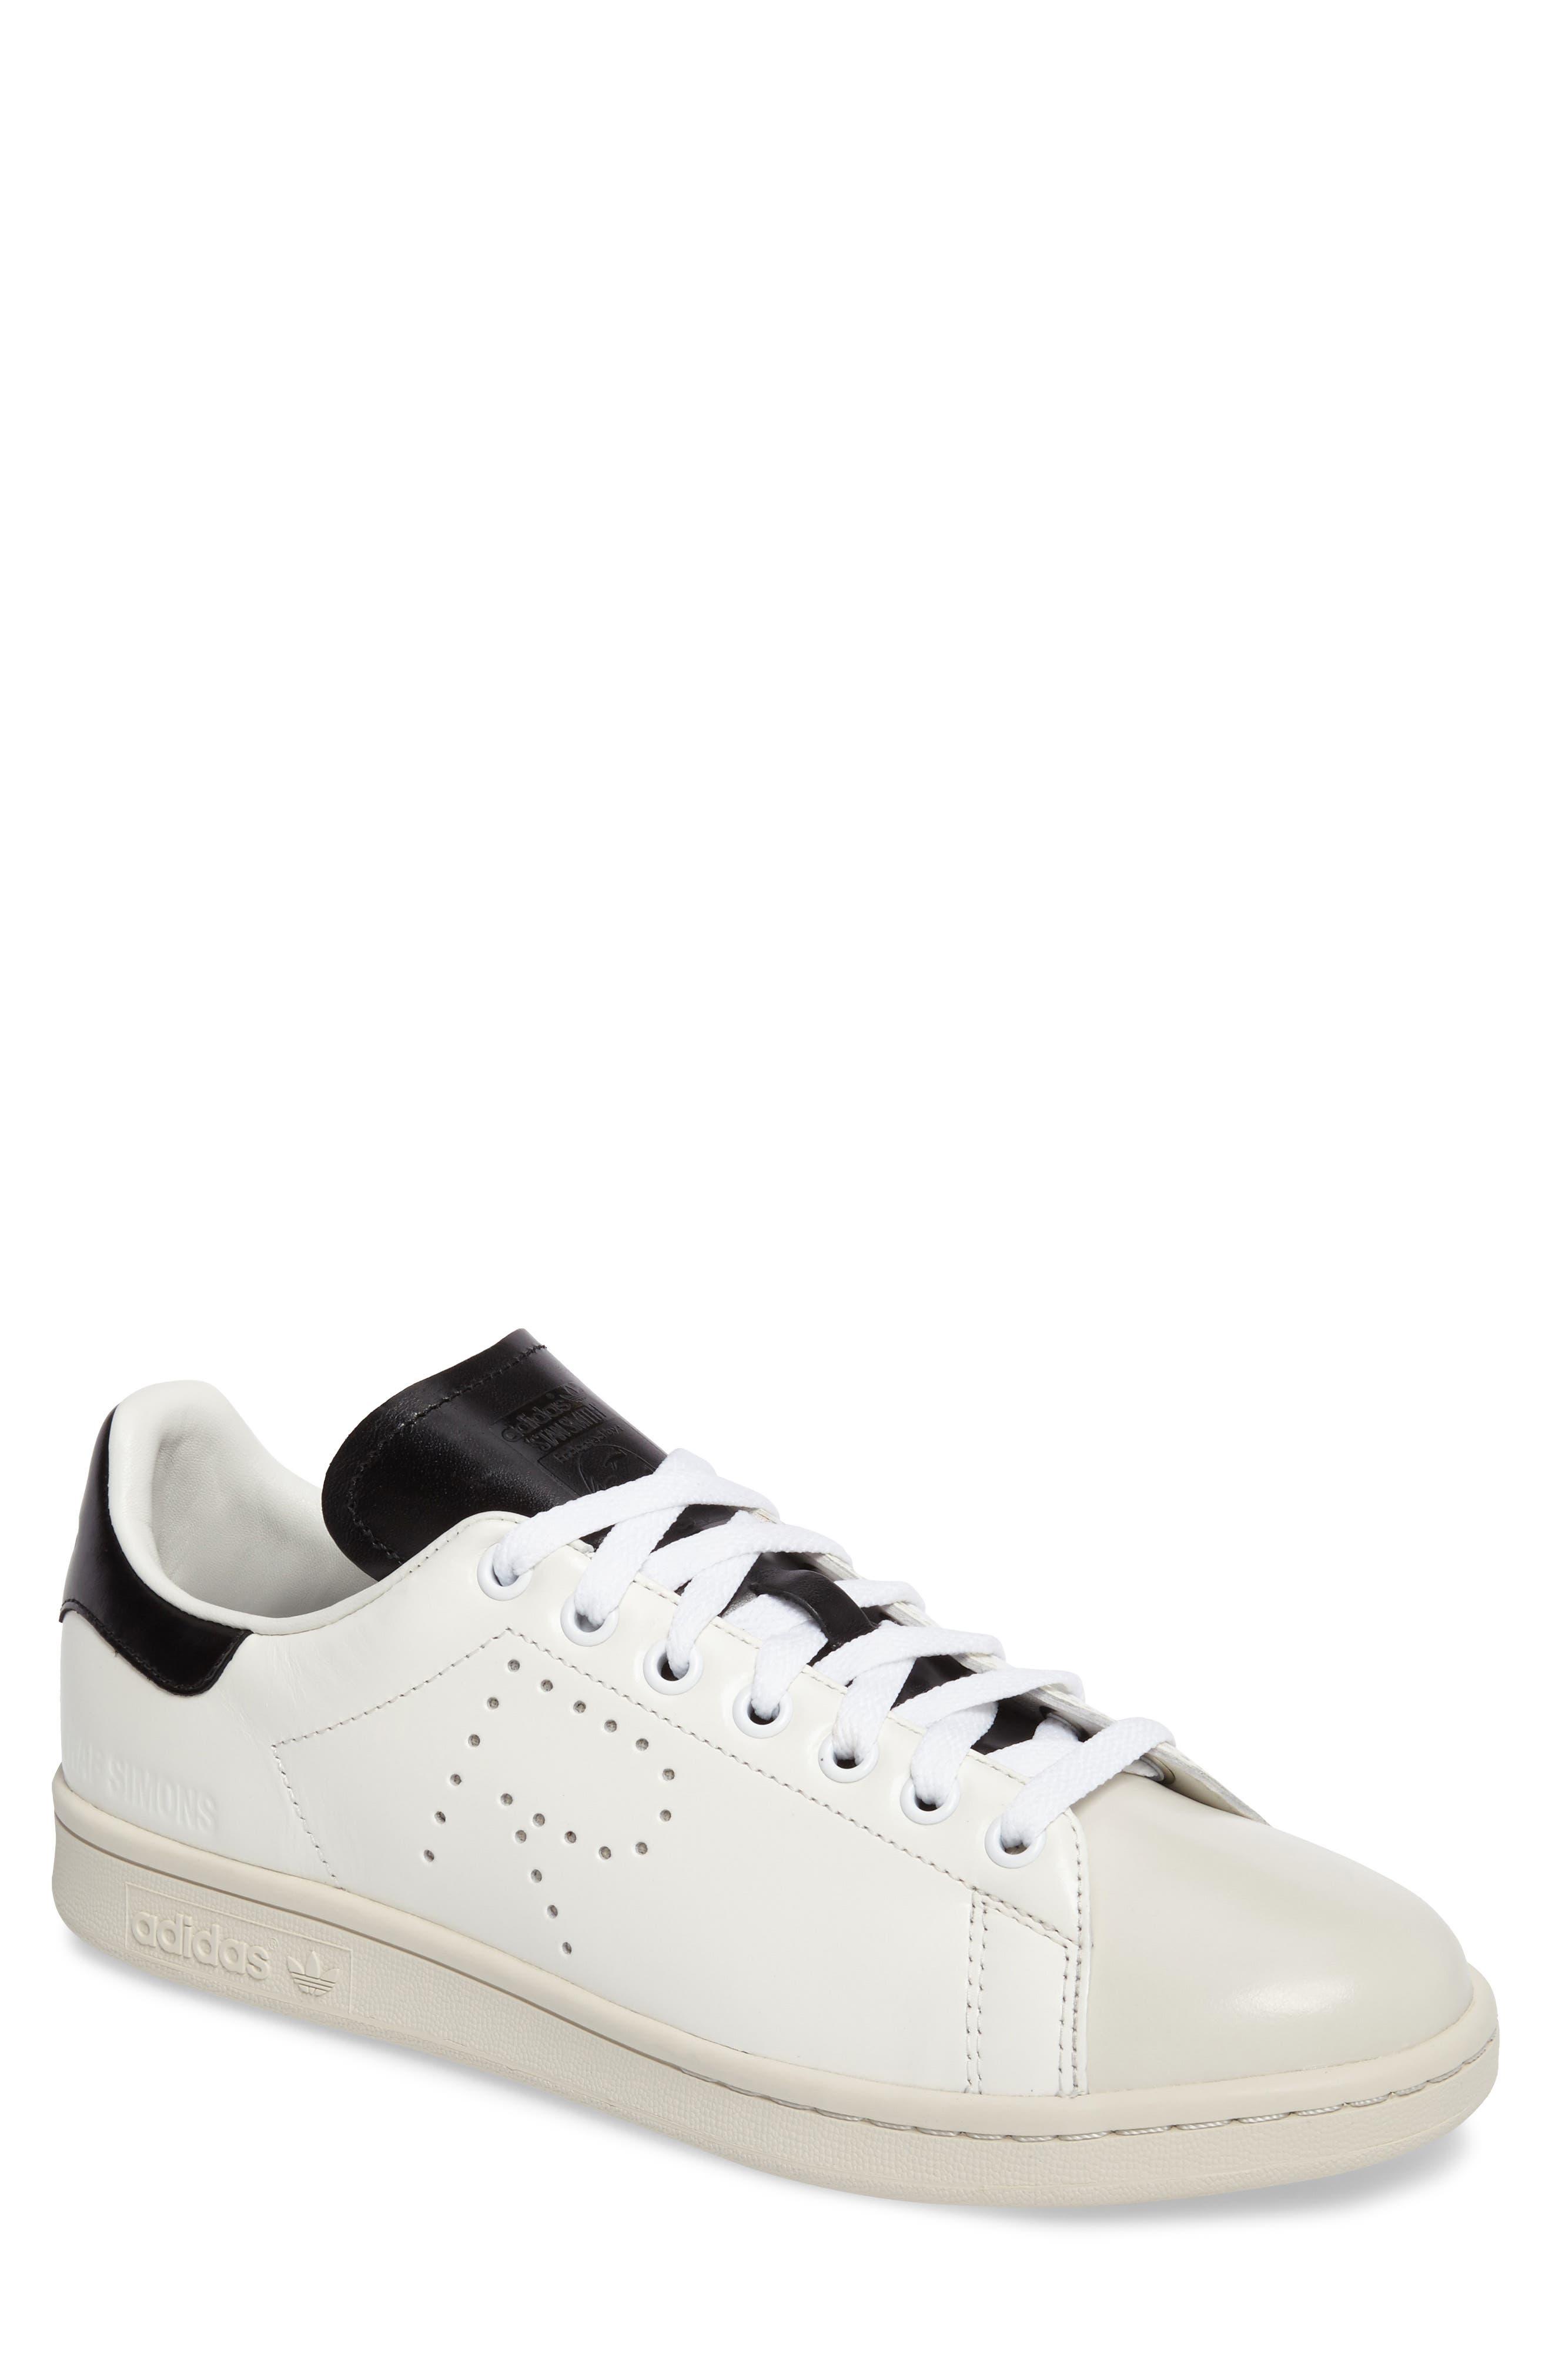 Main Image - adidas by Raf Simons \u0027Stan Smith\u0027 Sneaker ...